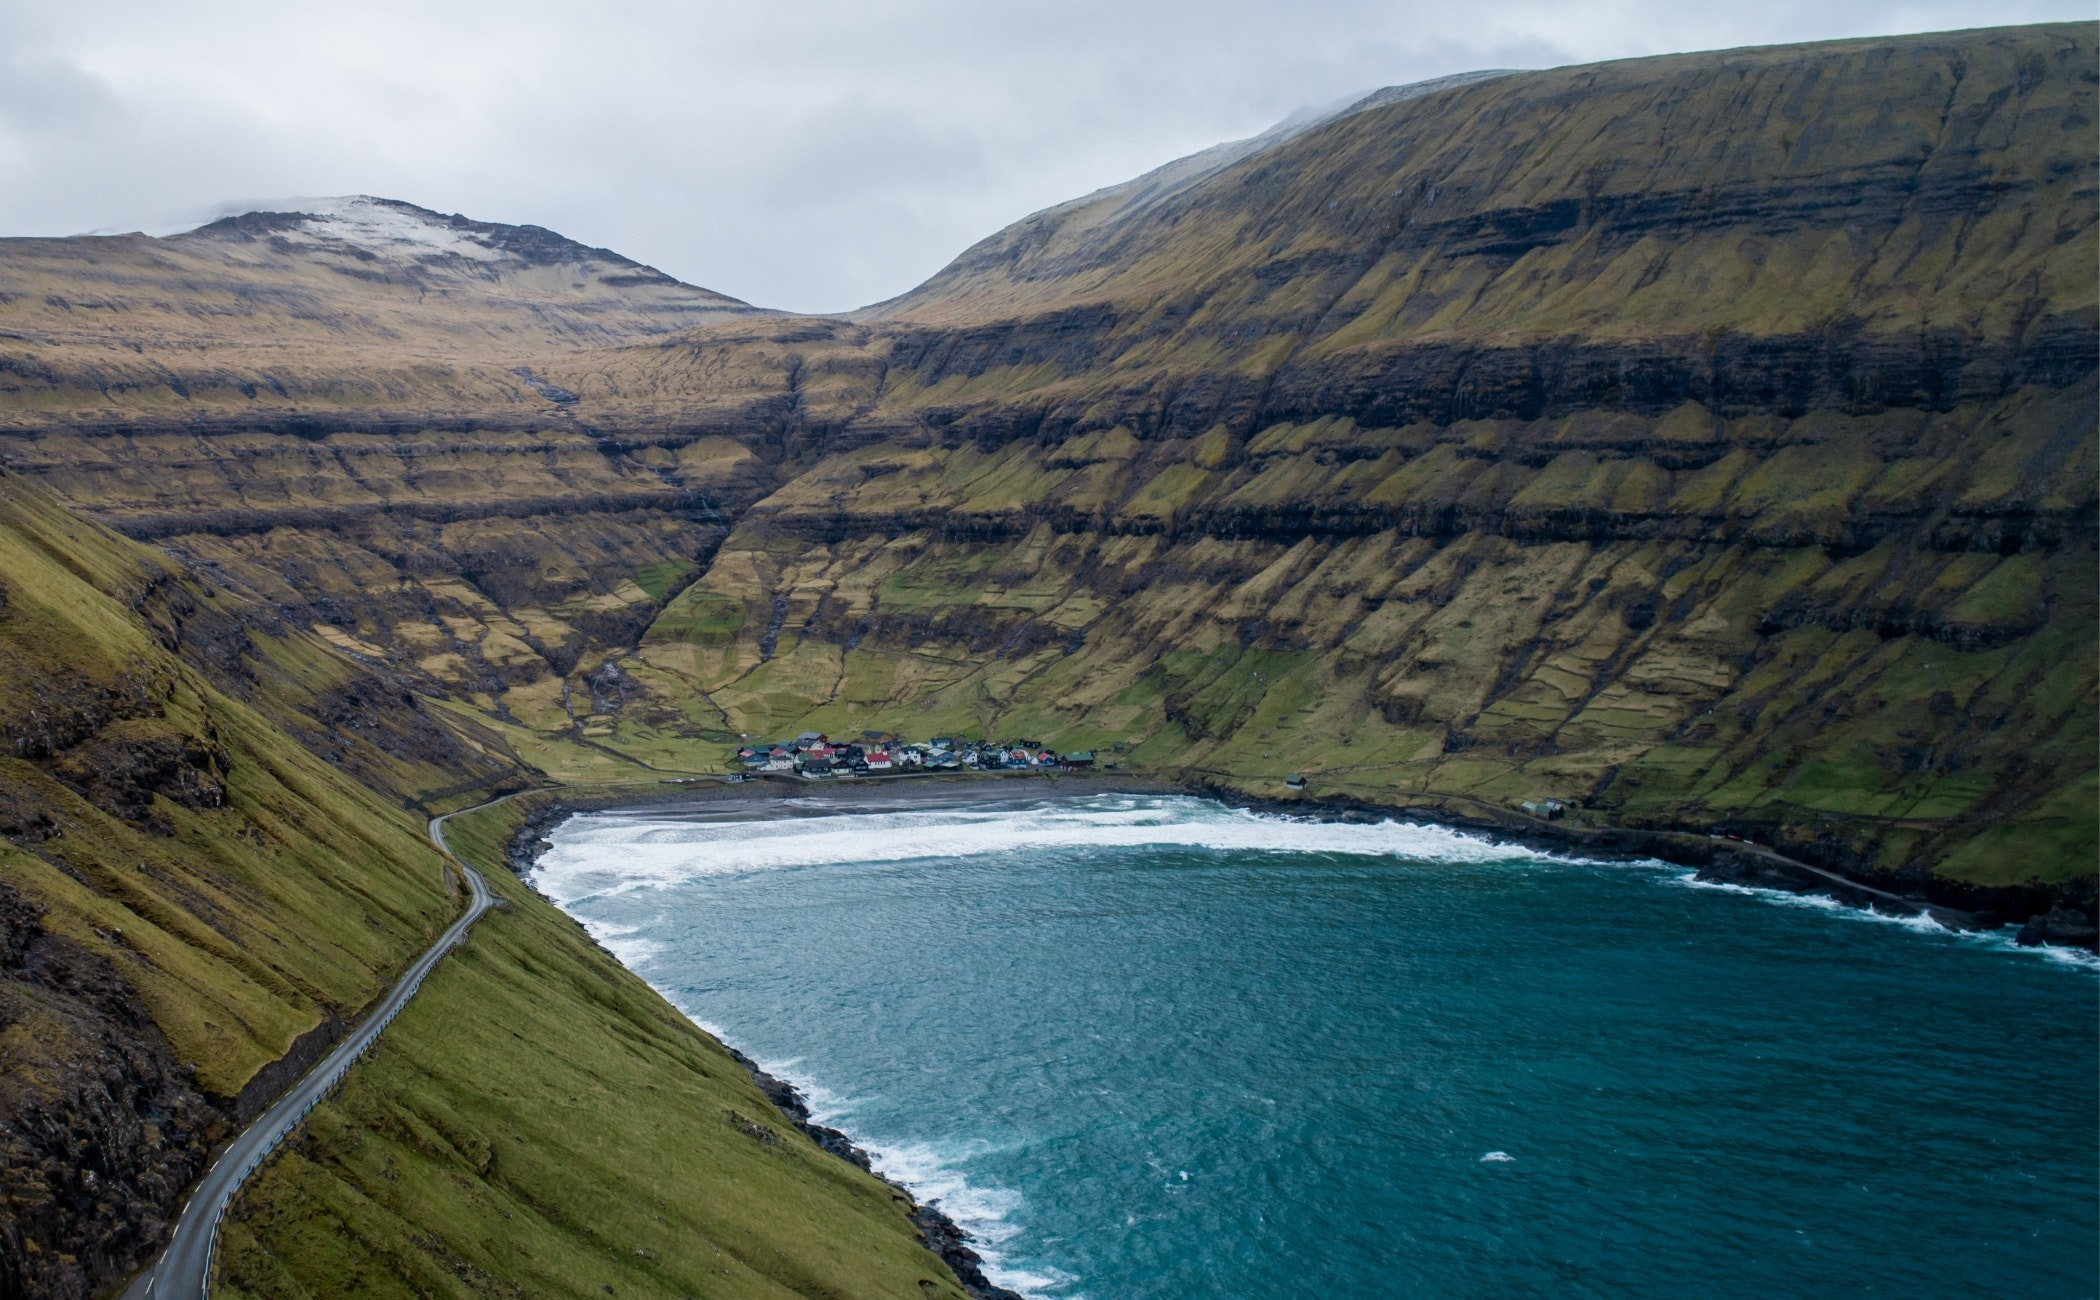 nature,outdoors,promontory,mountain,water,ocean,sea,slope,shoreline